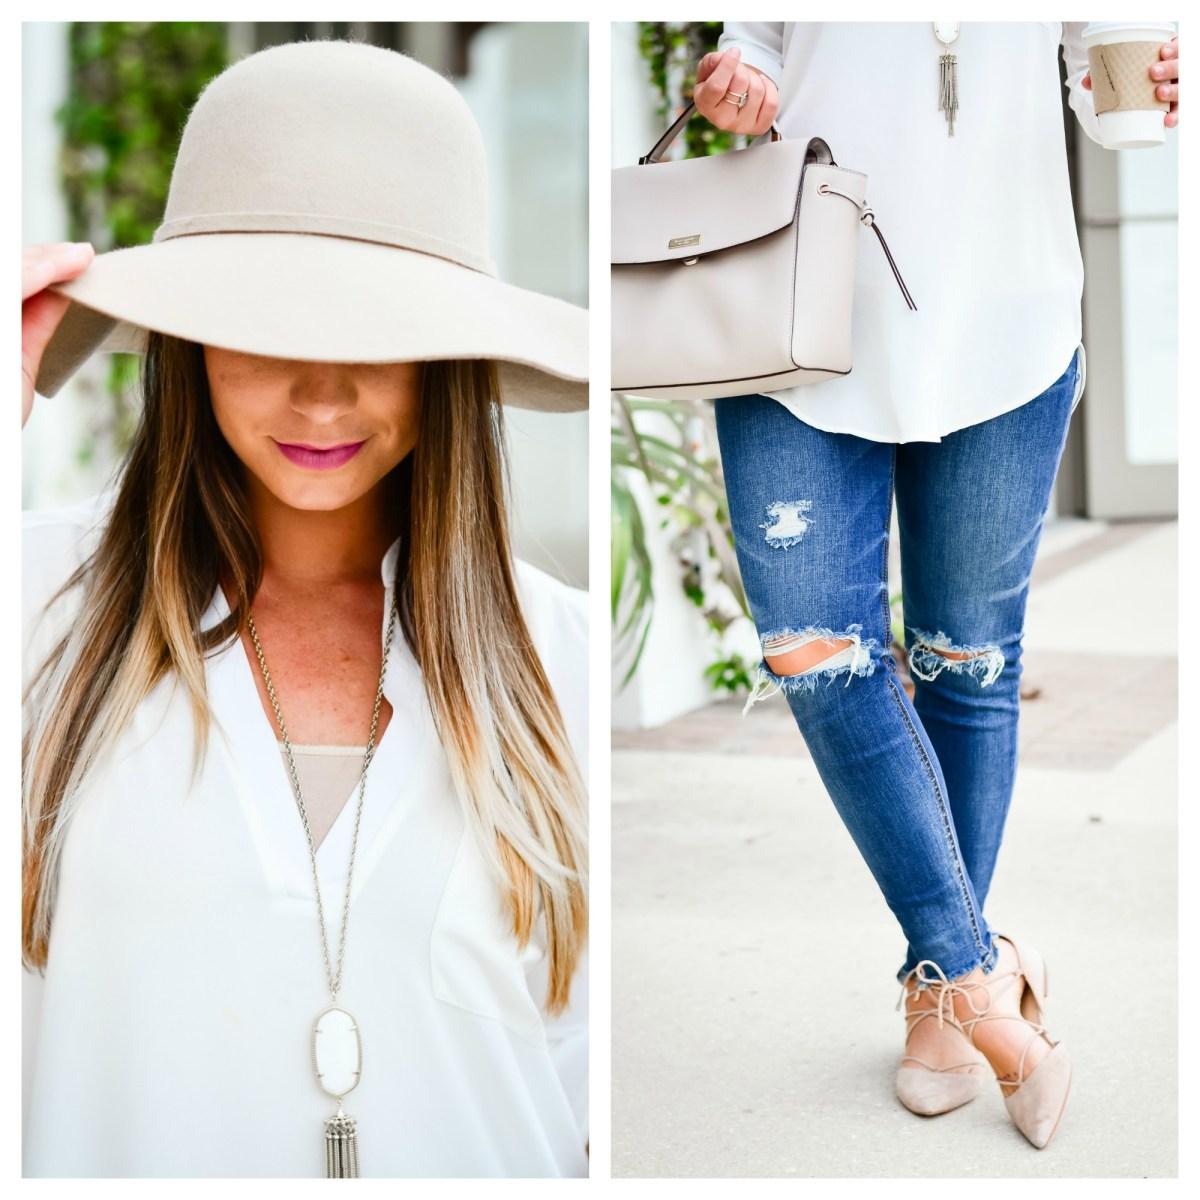 white-tunic-distressed-denim-floppy-hat